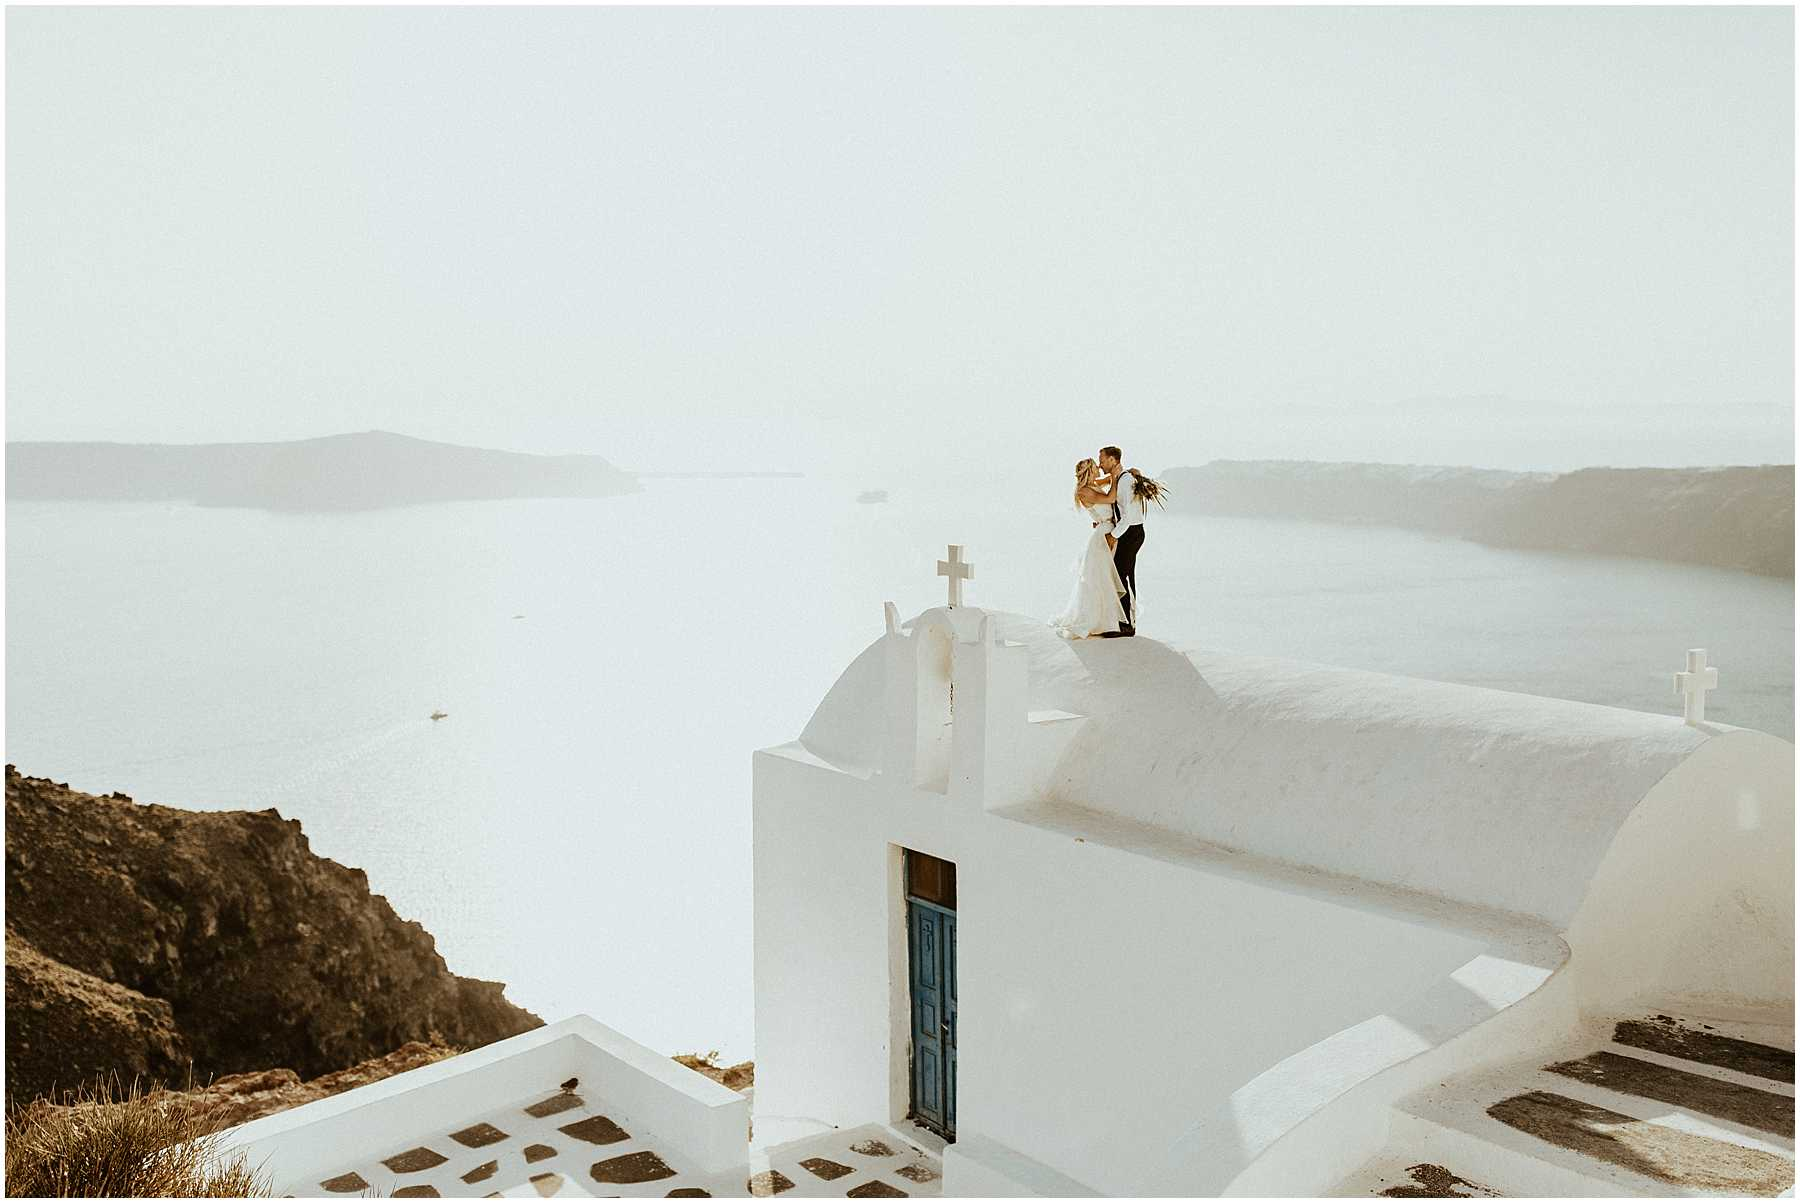 An adventurous elopement in Santorini Greece